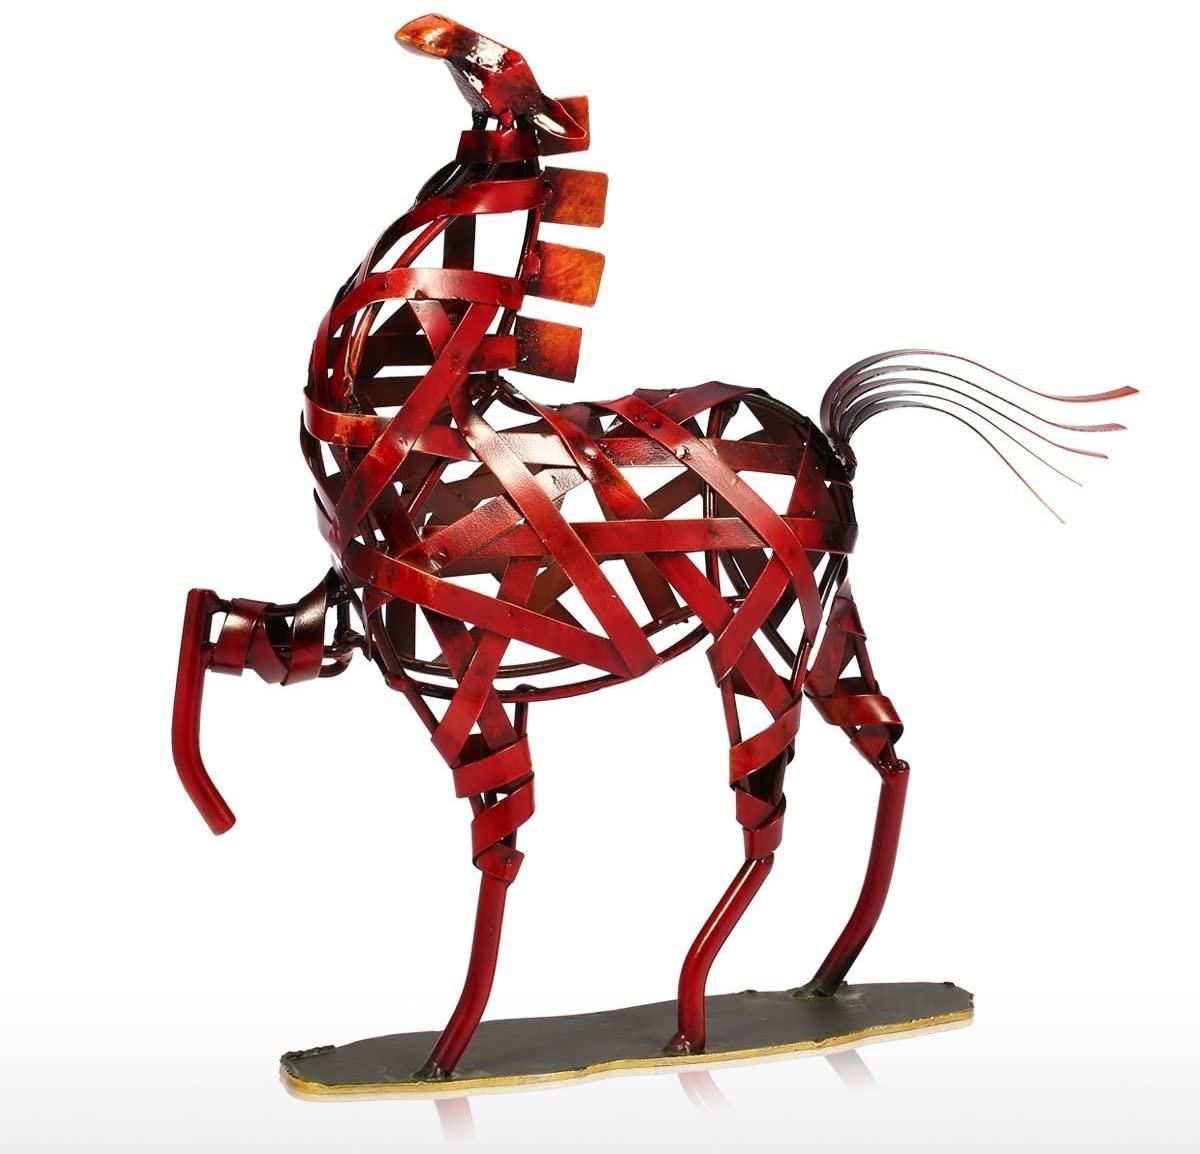 Tooarts Metal Weaving Horse Modern Sculpture Home Decoration Furnishing Handicrafts